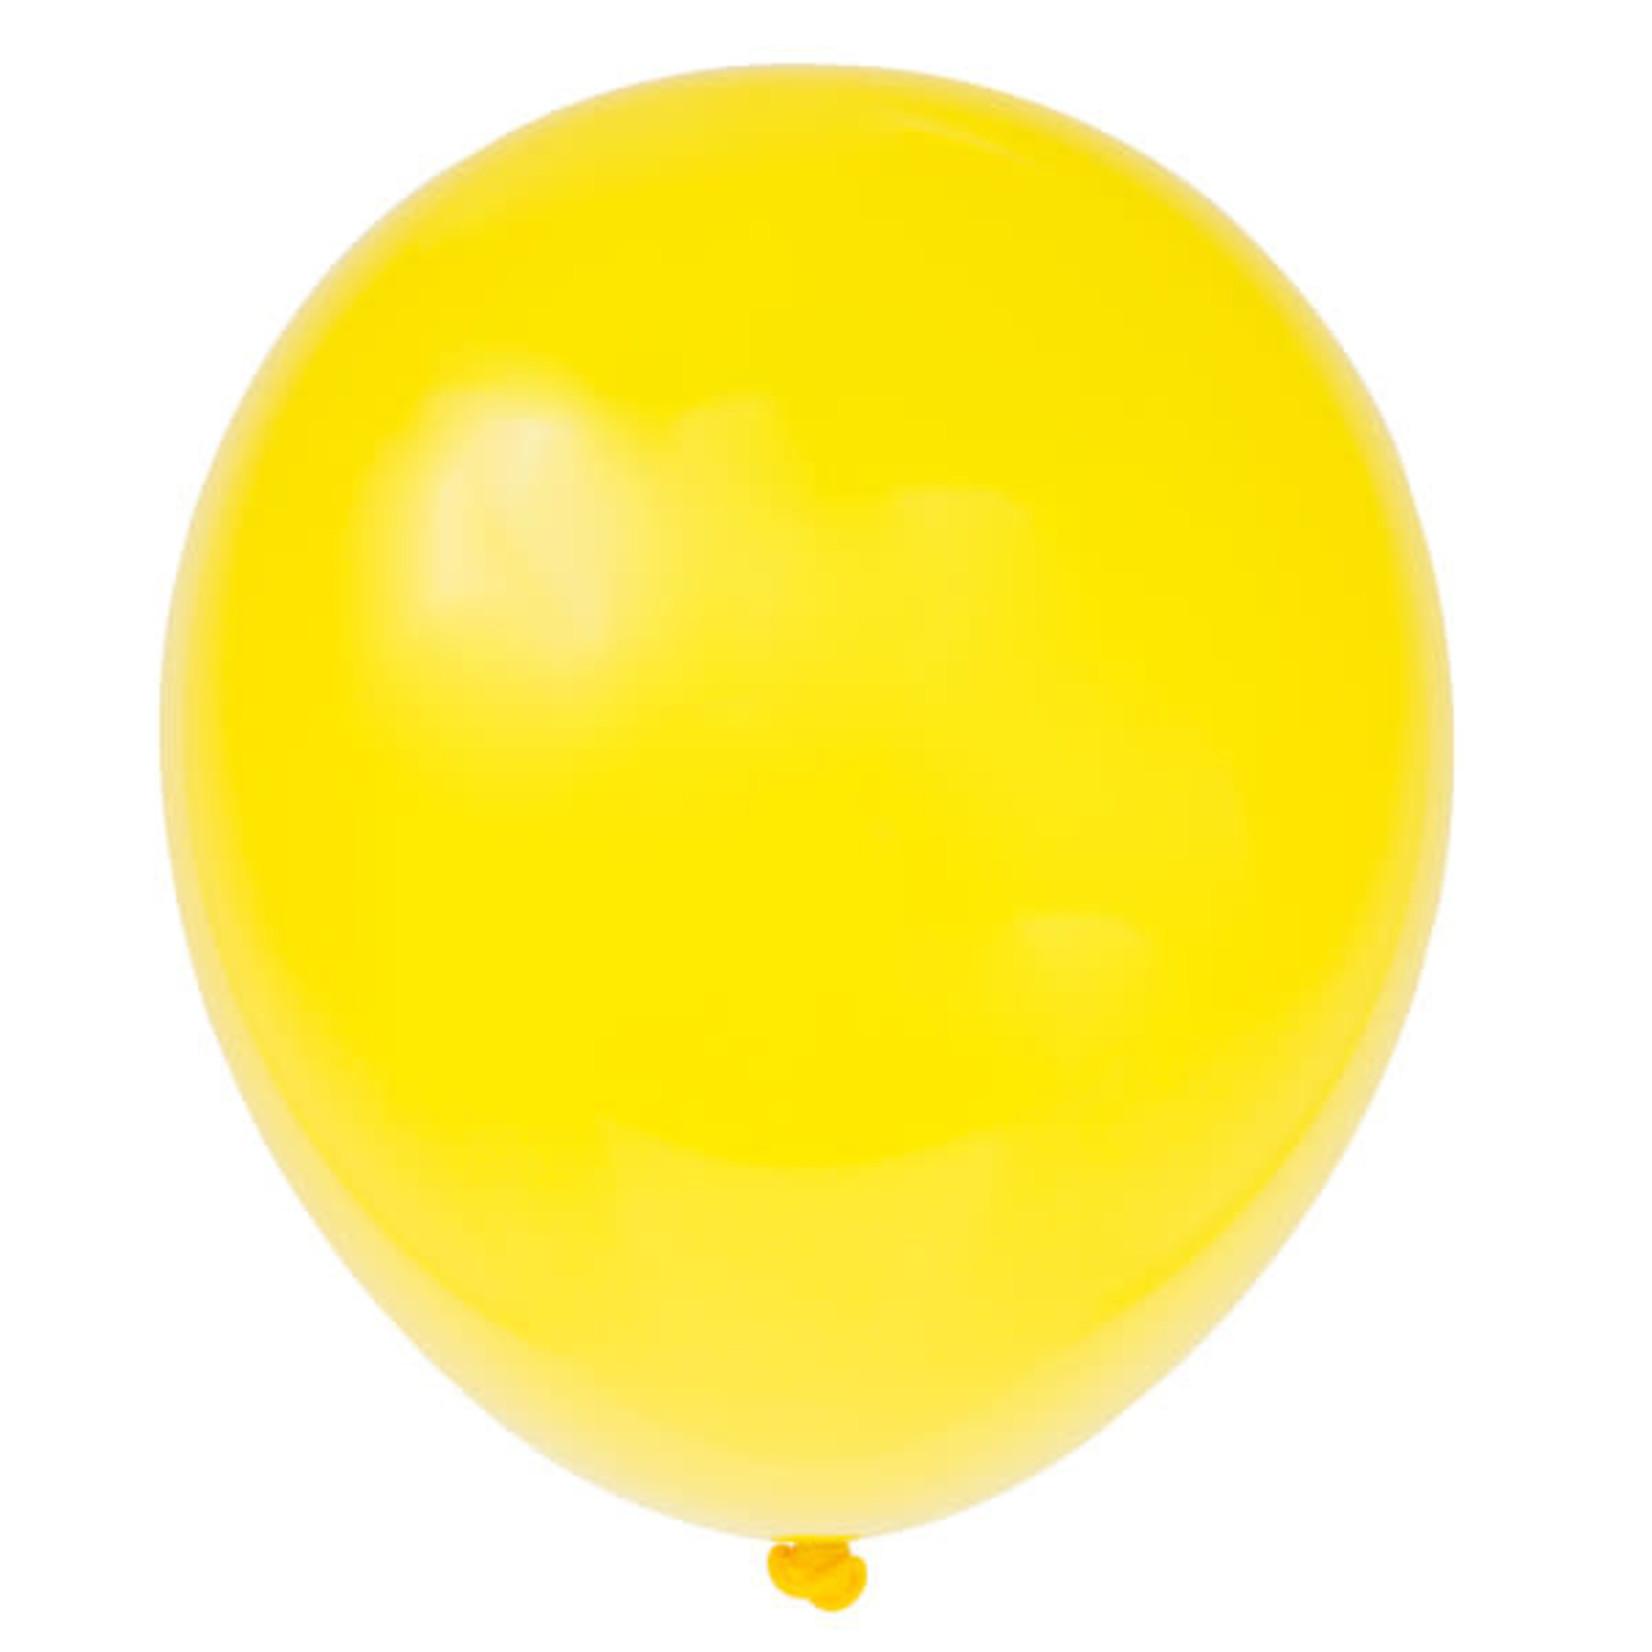 10 12'' YELLOW BALLOONS